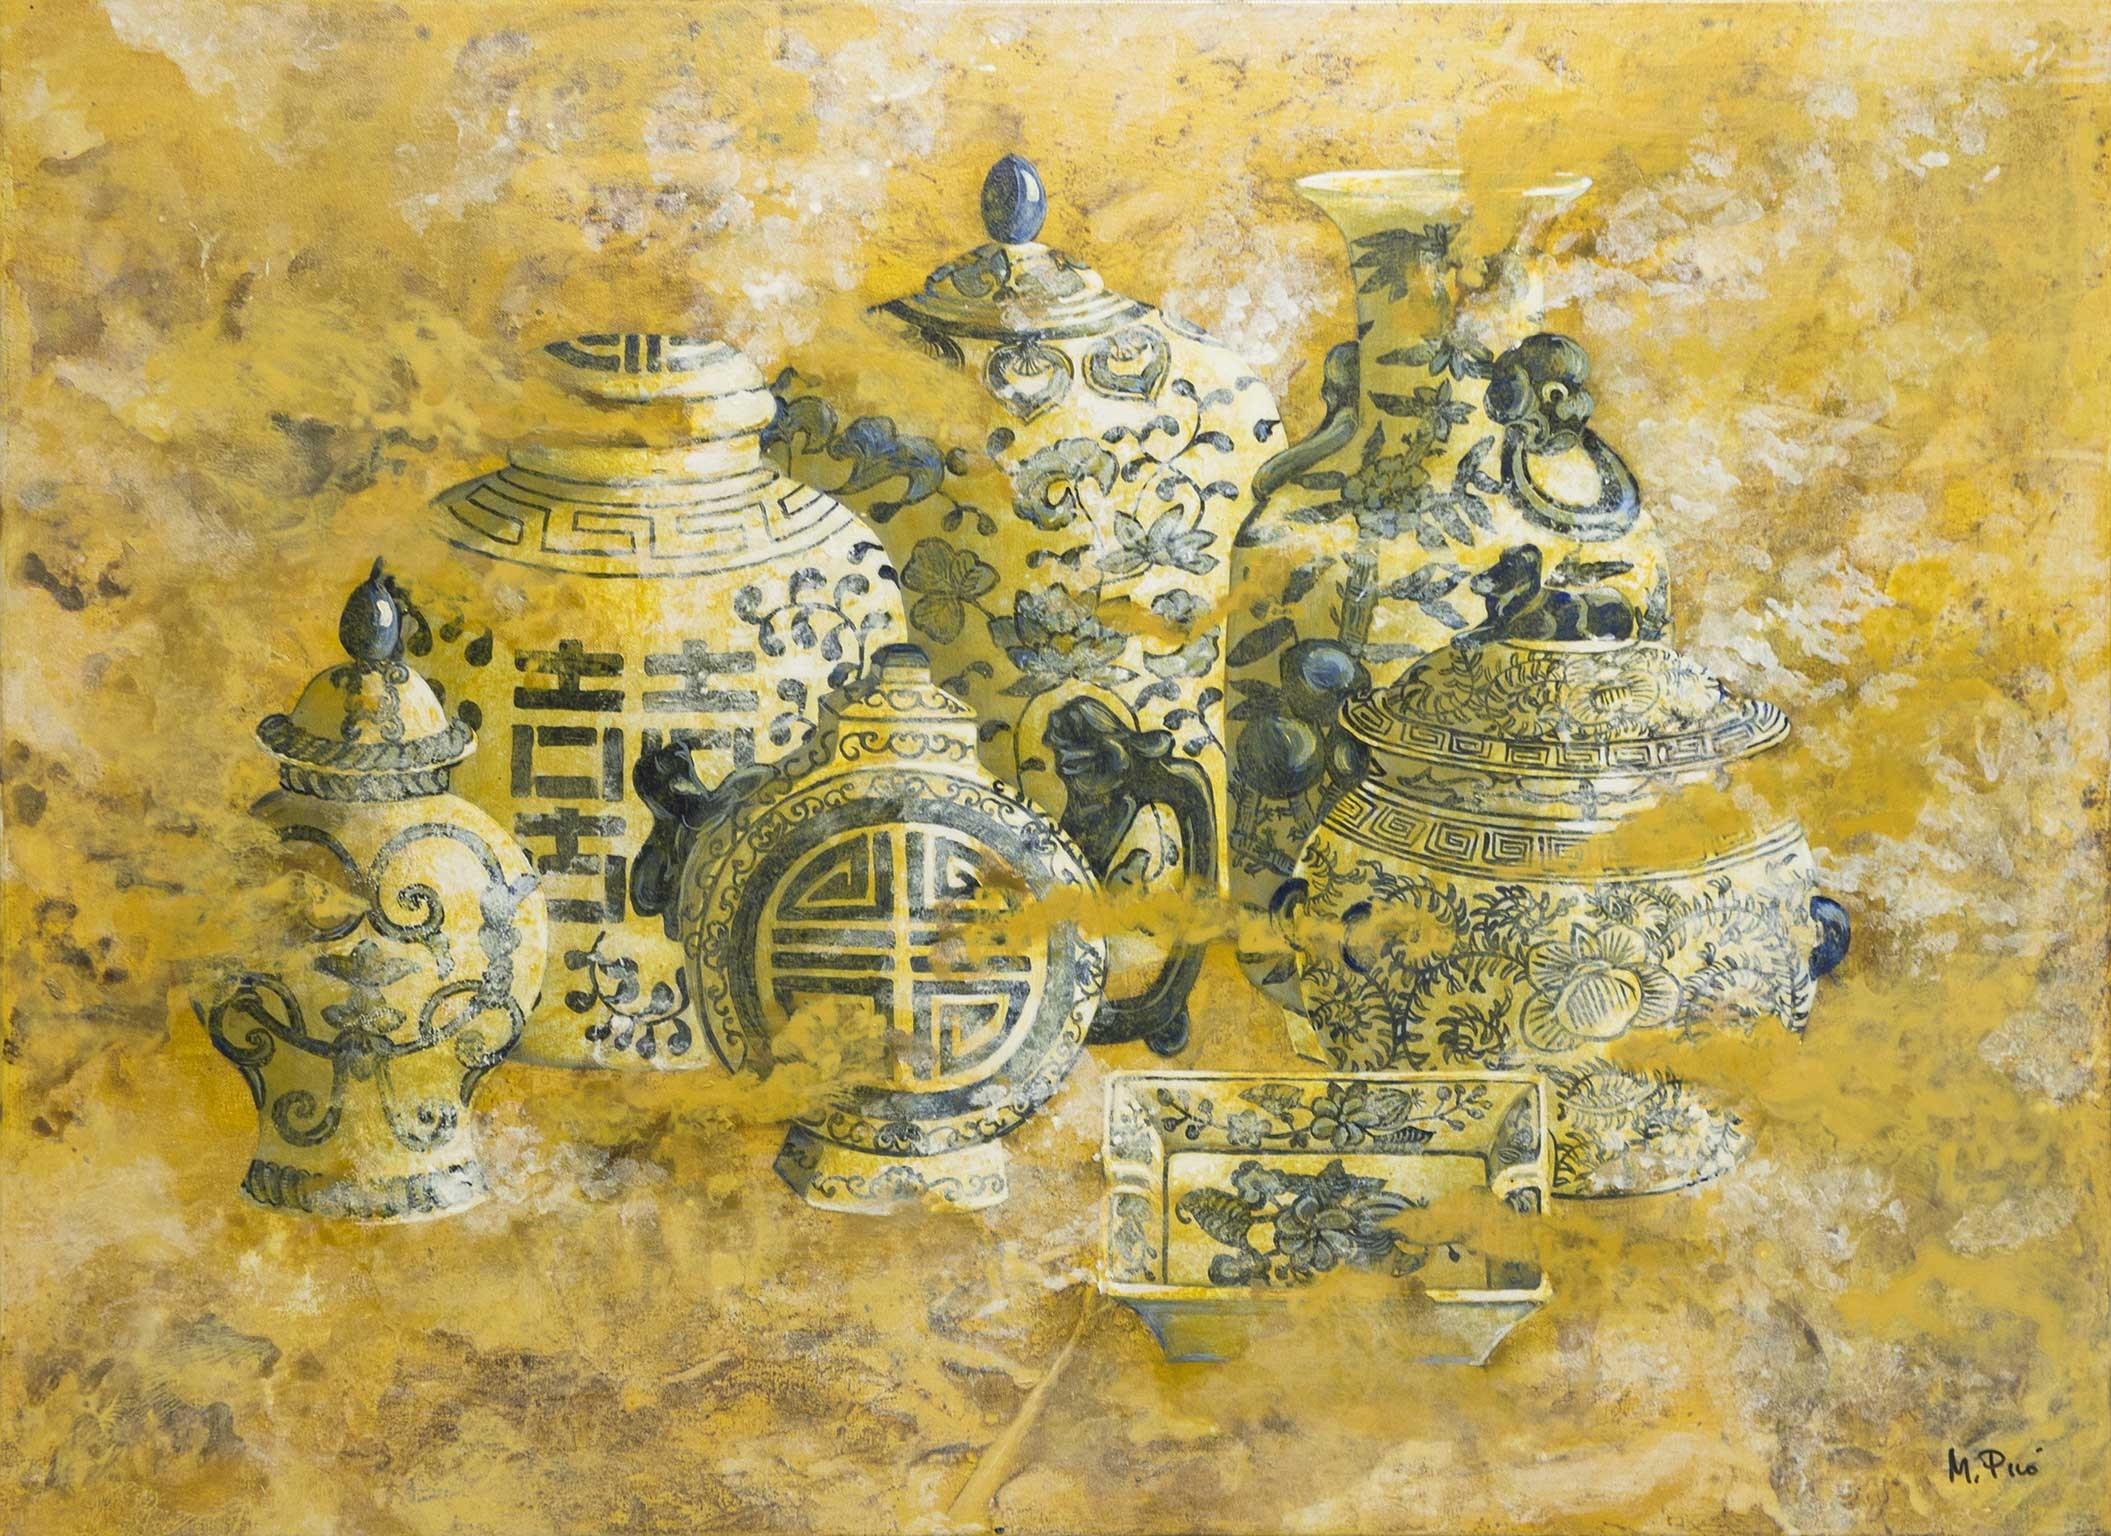 Serie Porcelana China - Manuela Picó Image